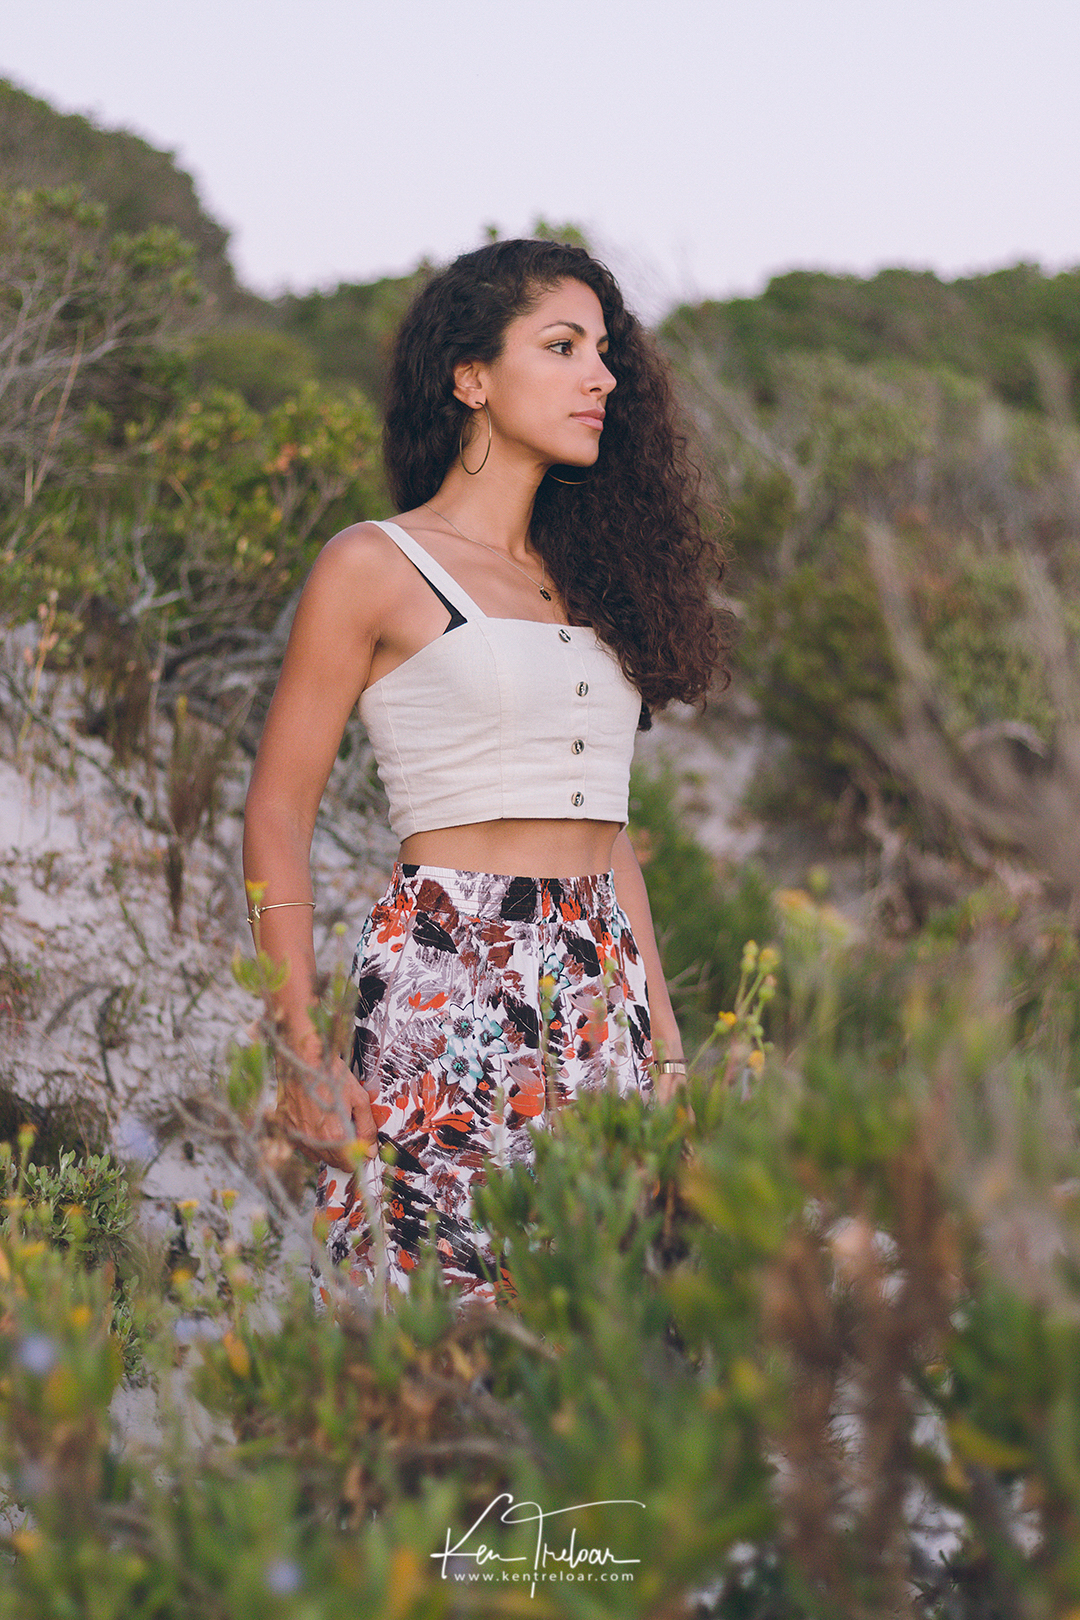 Portrait Photography Cape Town Kalk Bay Noordhoek by Ken Treloar - all rights reserved-17.jpg